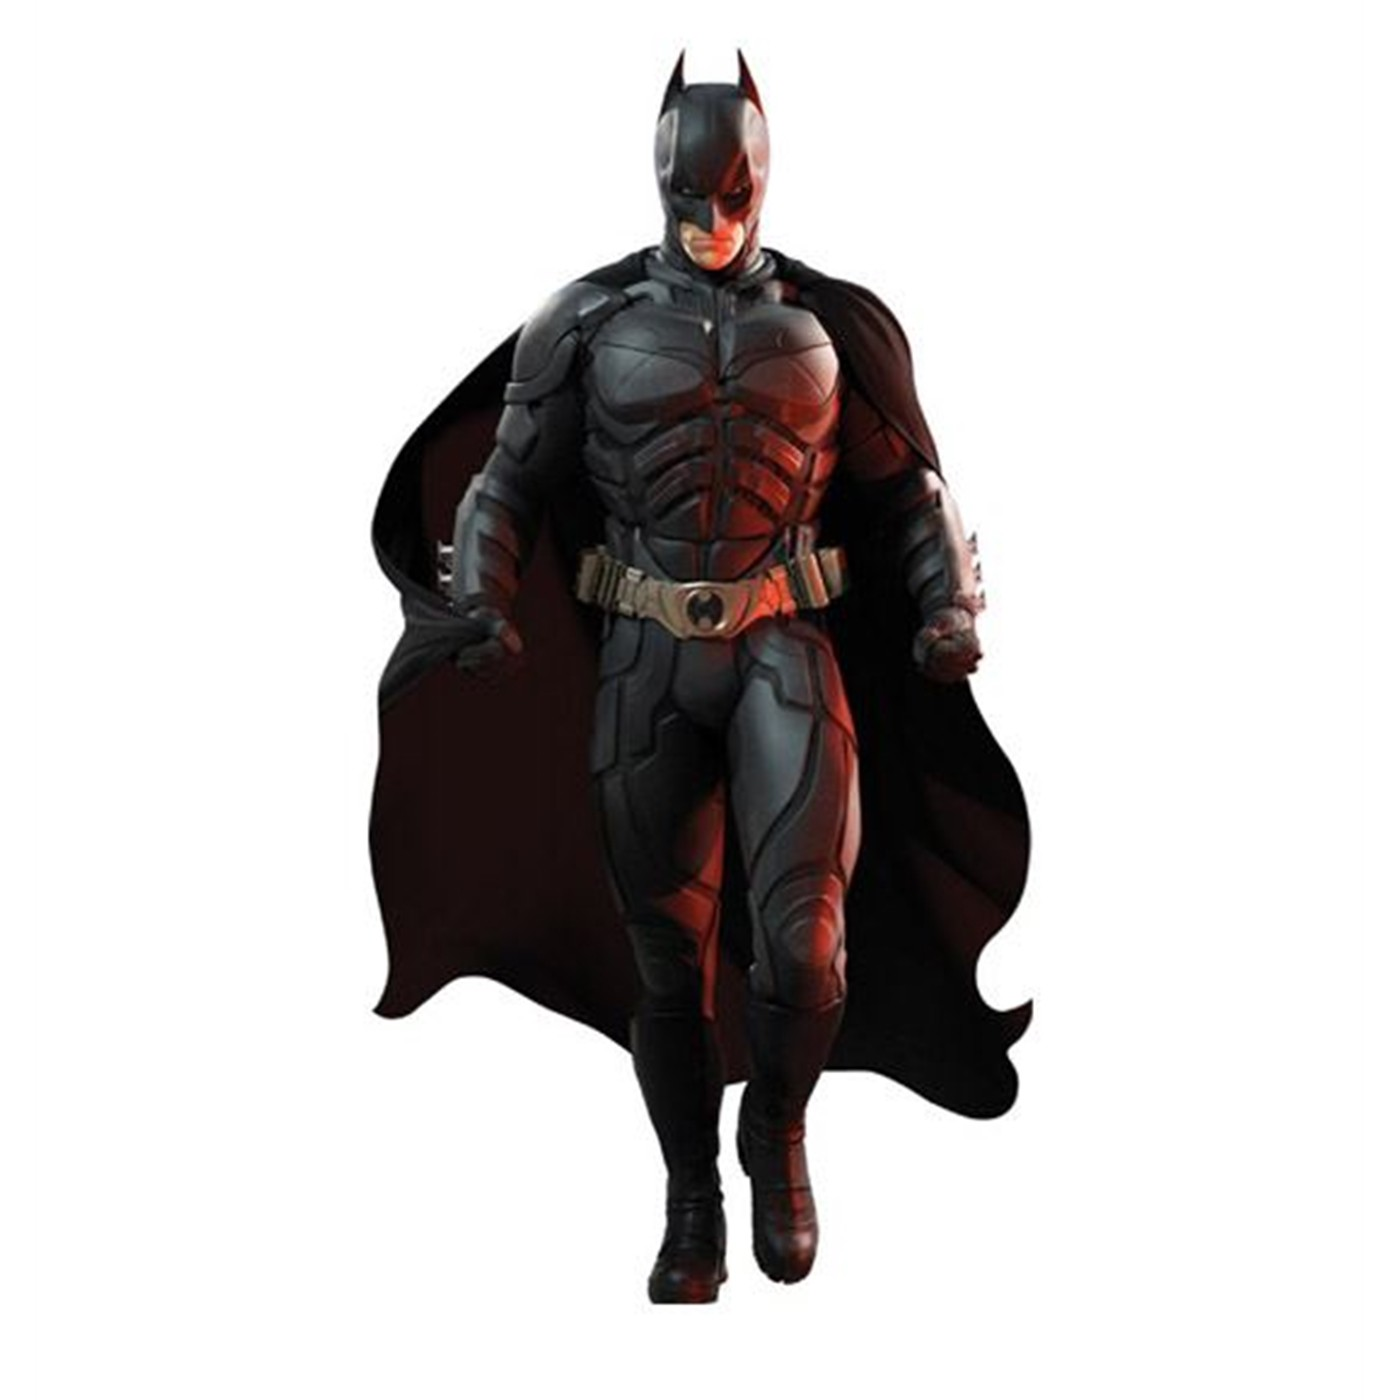 Dark Knight Rises Batman Cardboard Cutout